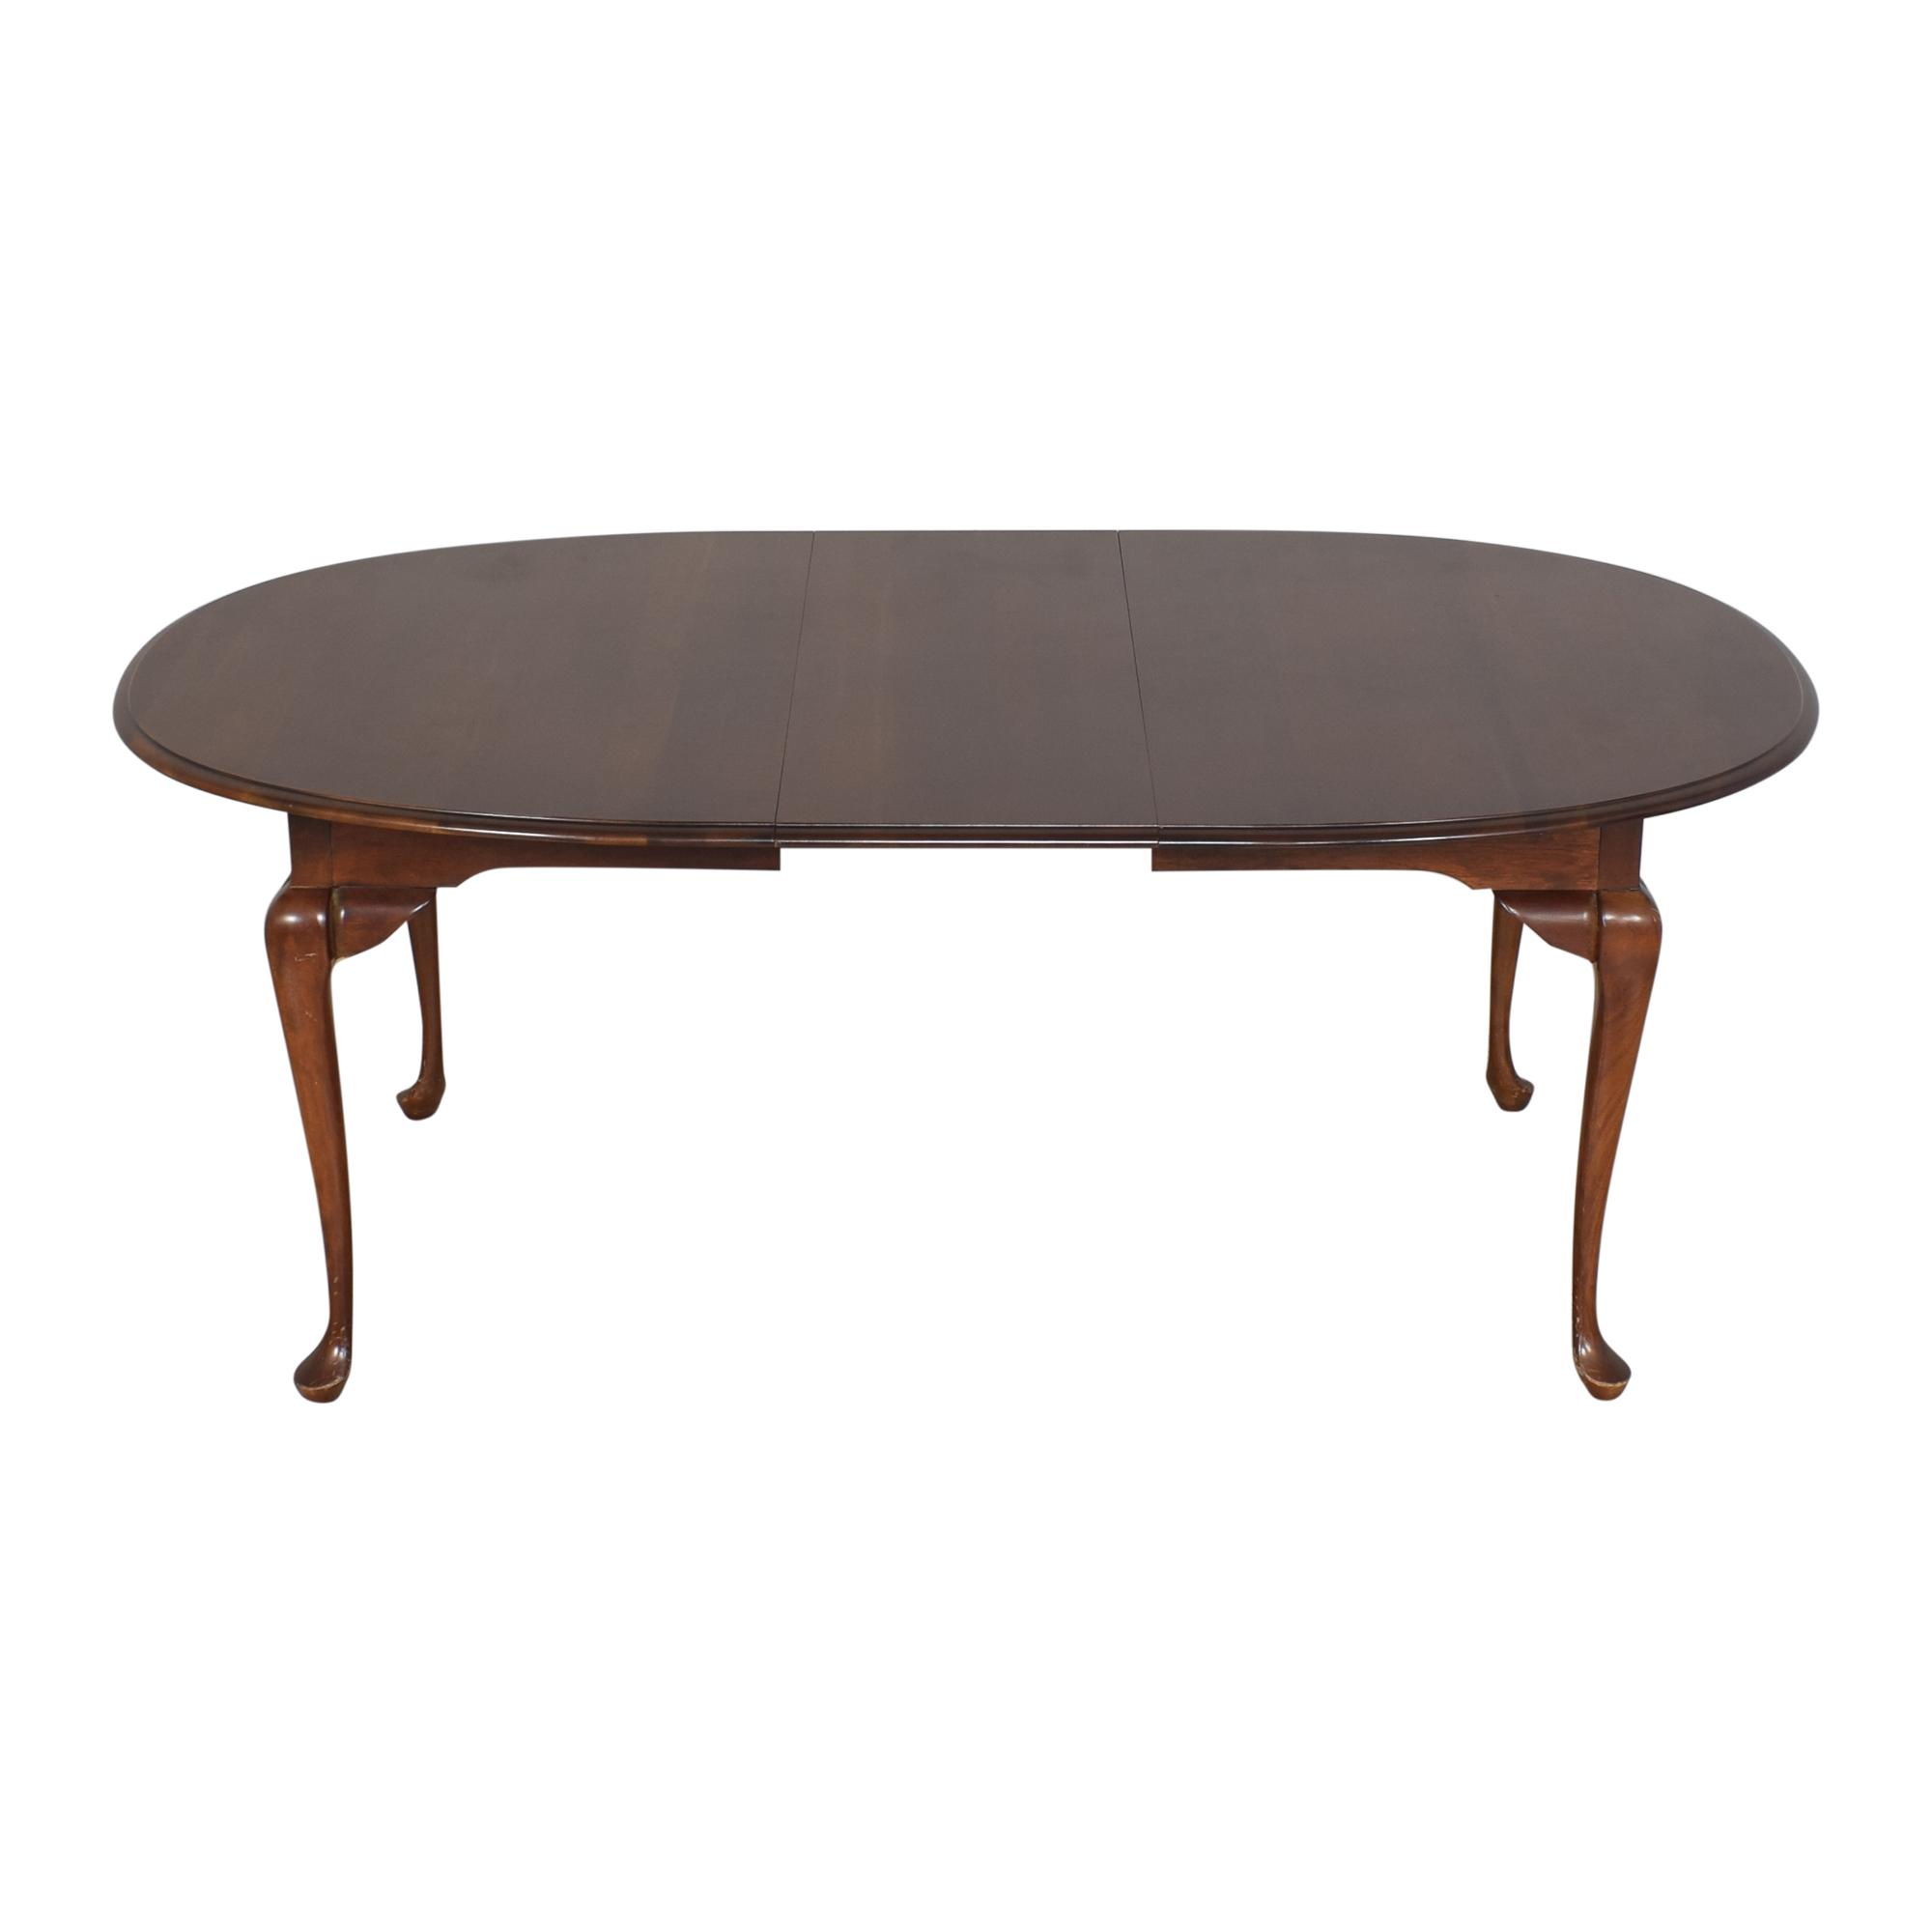 Drexel Heritage Drexel Heritage Queen Anne Dining Table nj